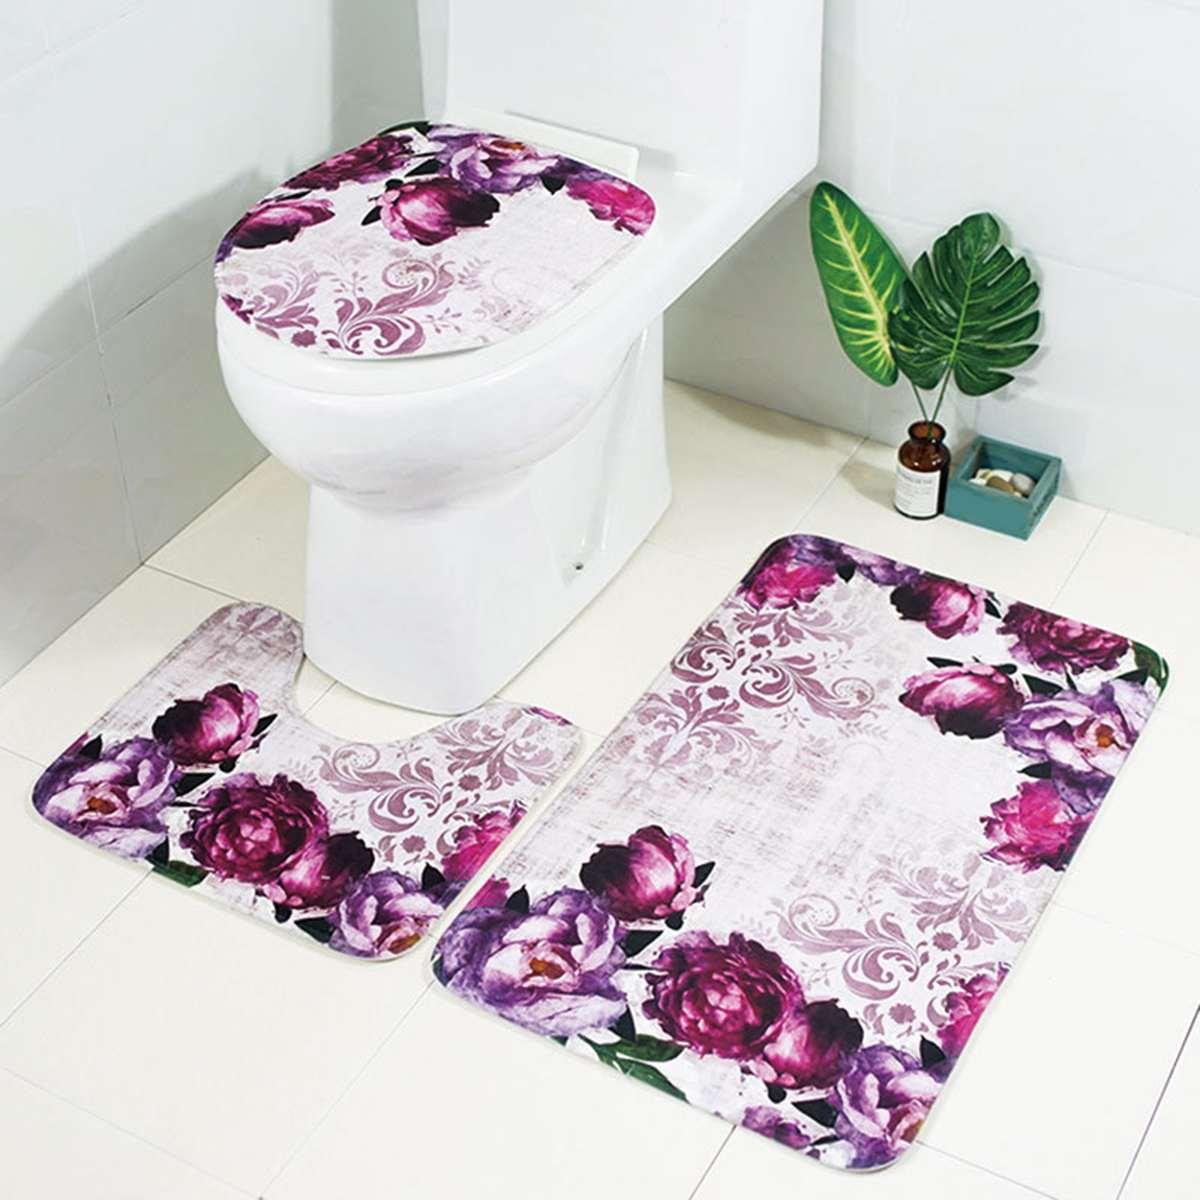 3Pcs/Set 3D Purple Flower Pattern Absorbent Bathroom Carpet Non-Slip Pedestal Floor Rug Lid Toilet Seat Cover Bath Mat